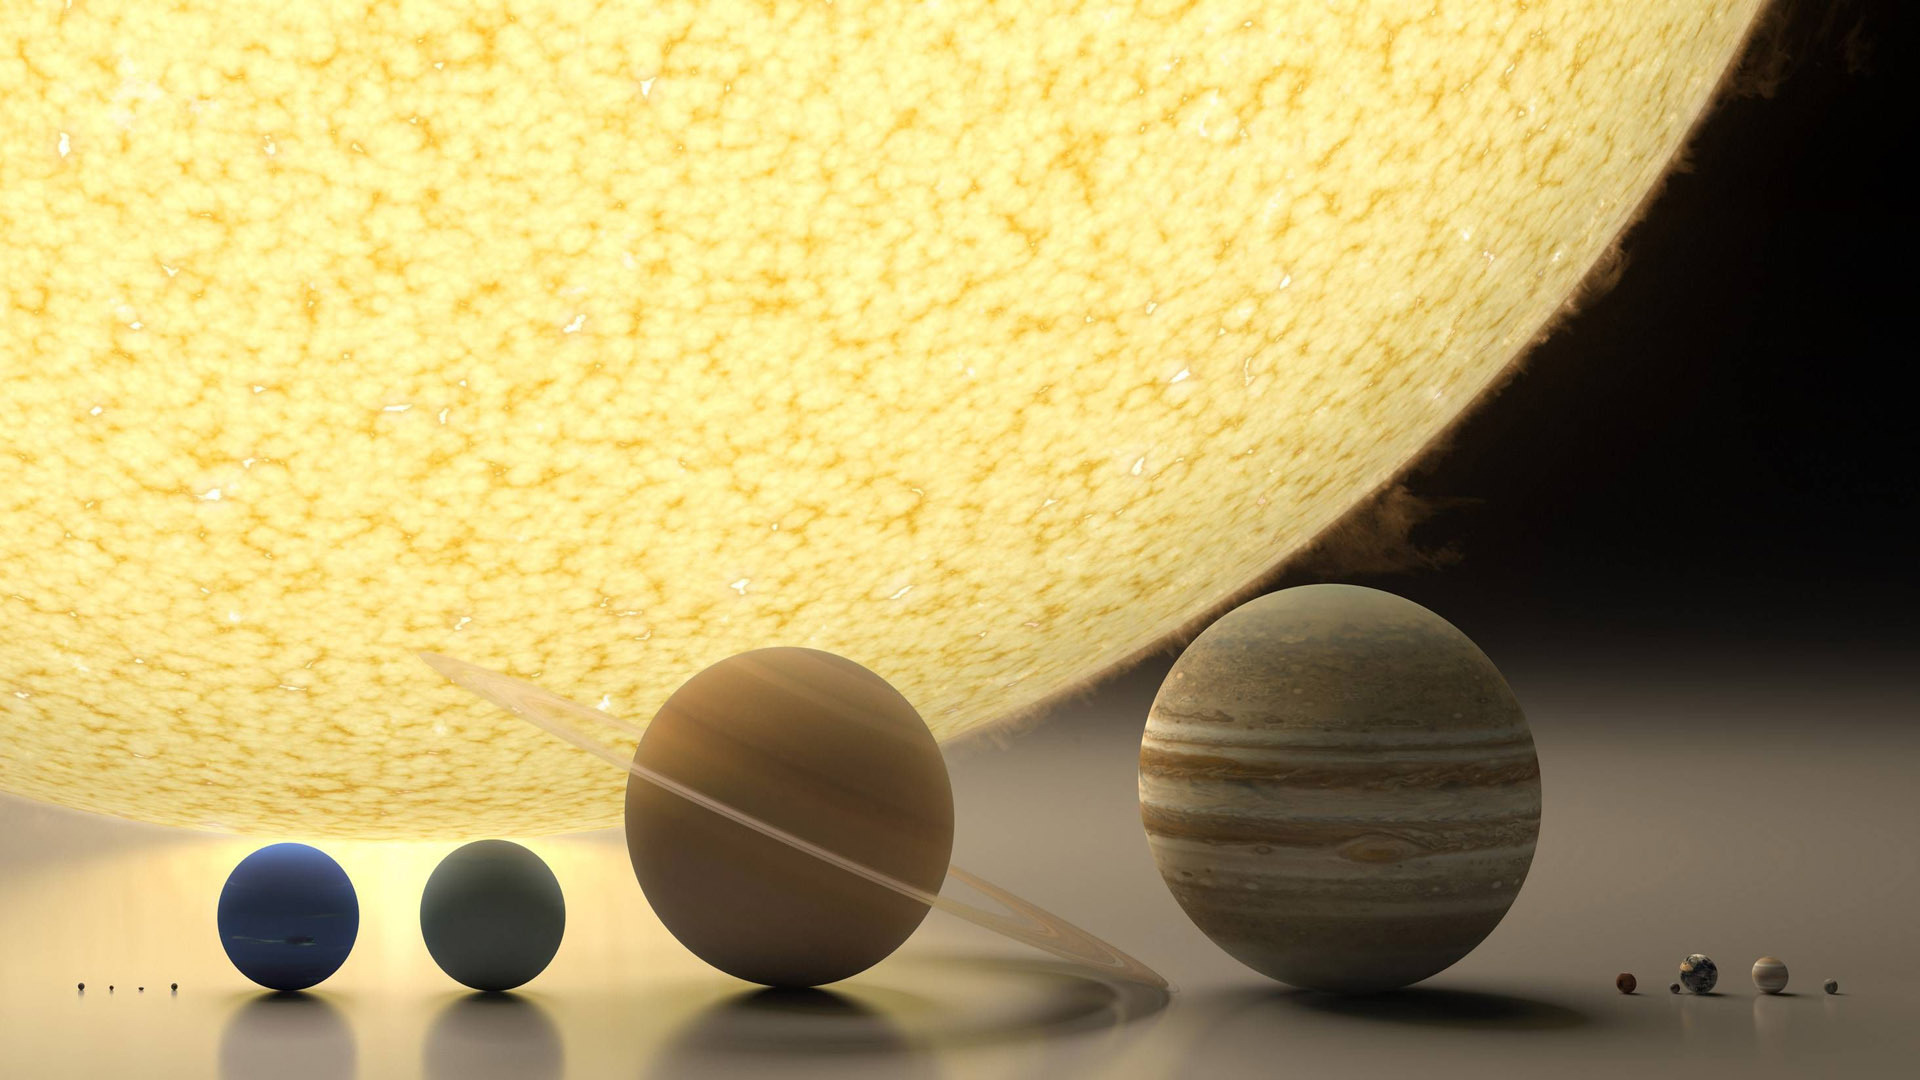 Fall Pixel Art Iphone Wallpaper Hd Solar System Backgrounds Pixelstalk Net